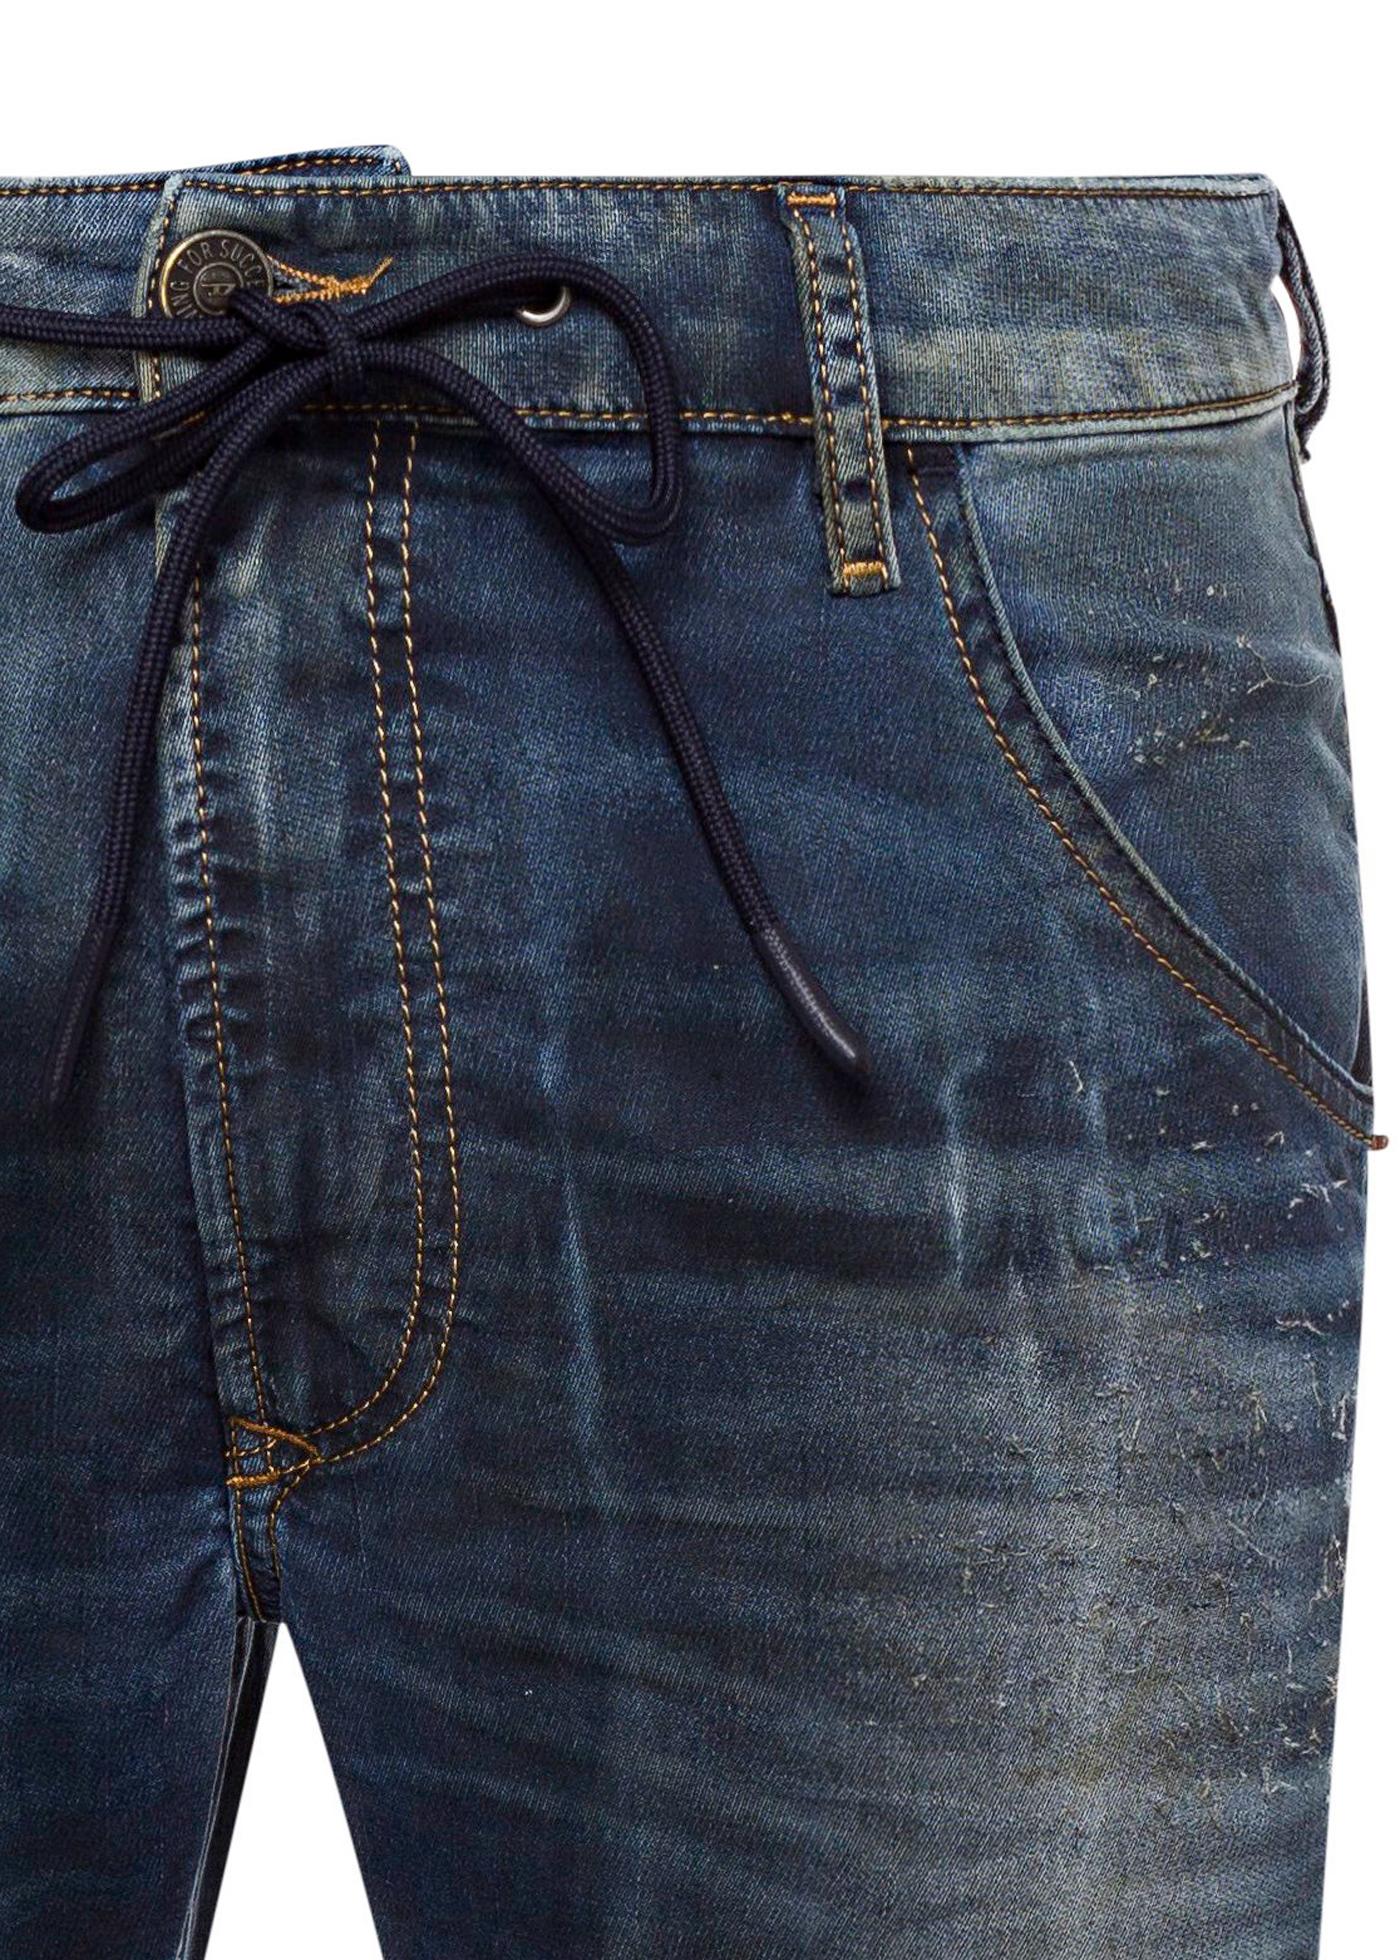 KROOLEY-Y-NE L.32 Sweat jeans image number 2